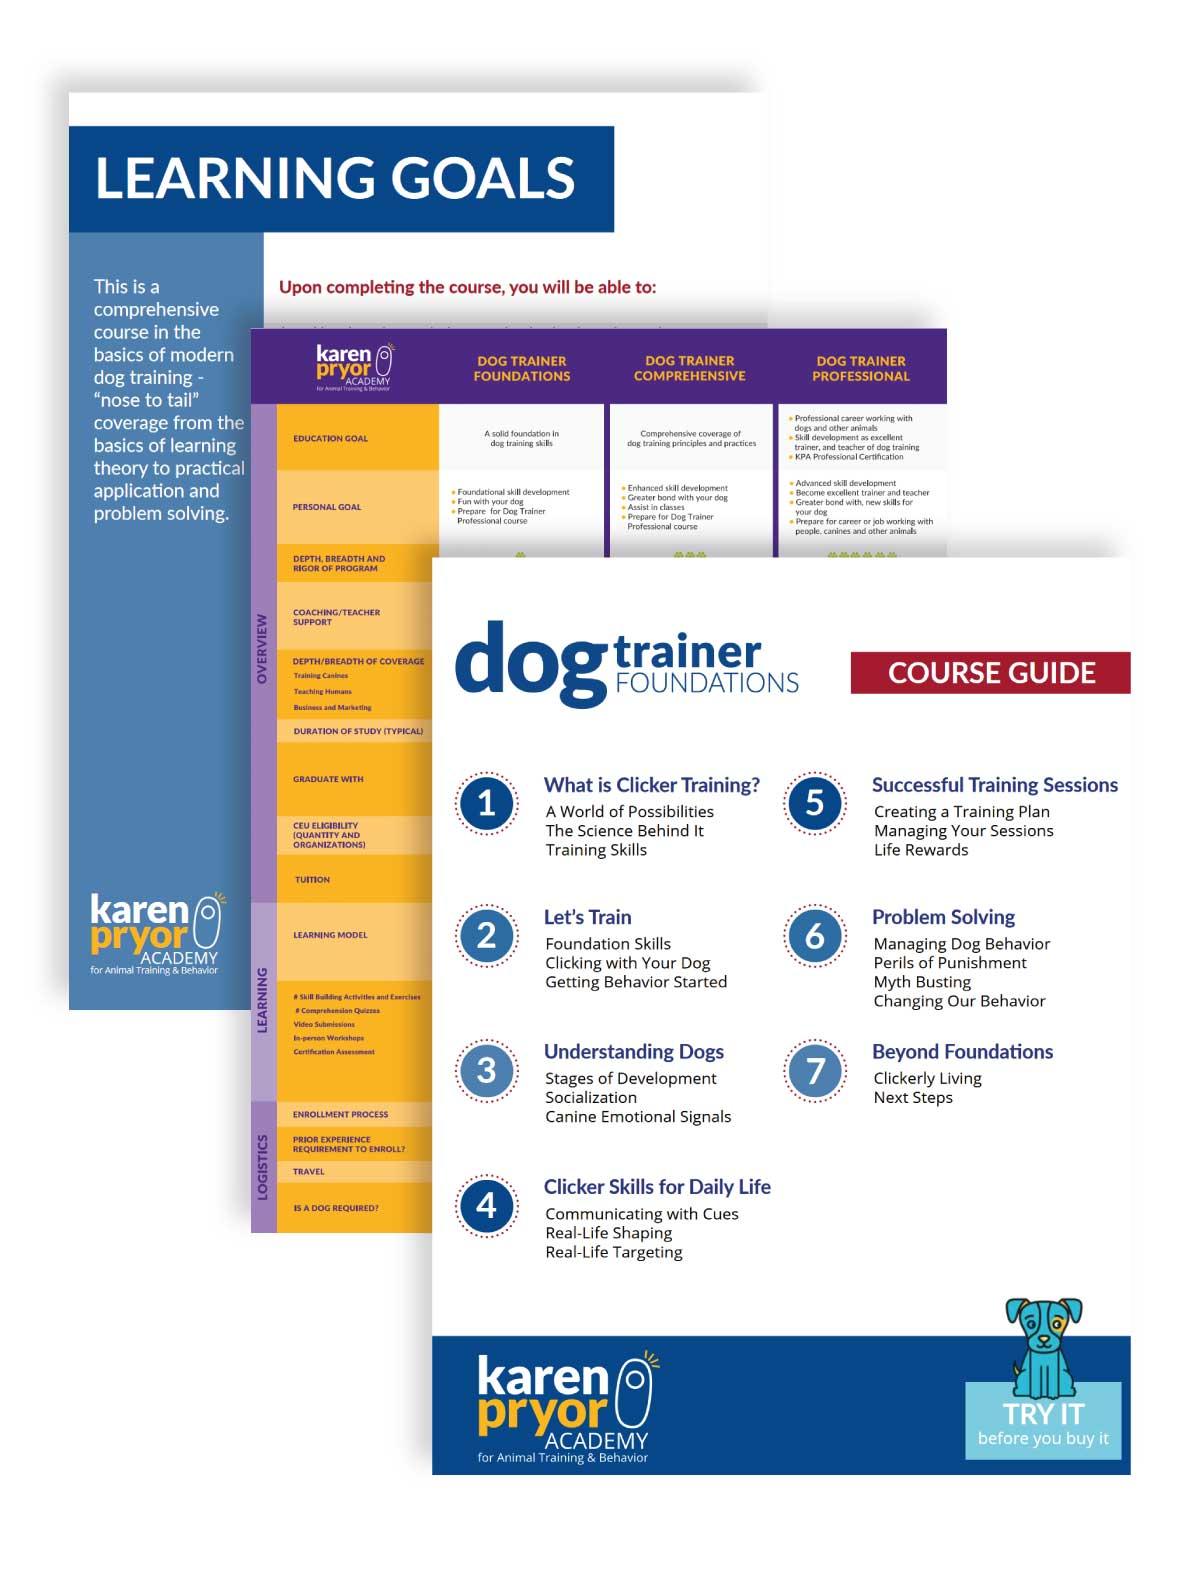 Web design pages for Karen Pryor Academy